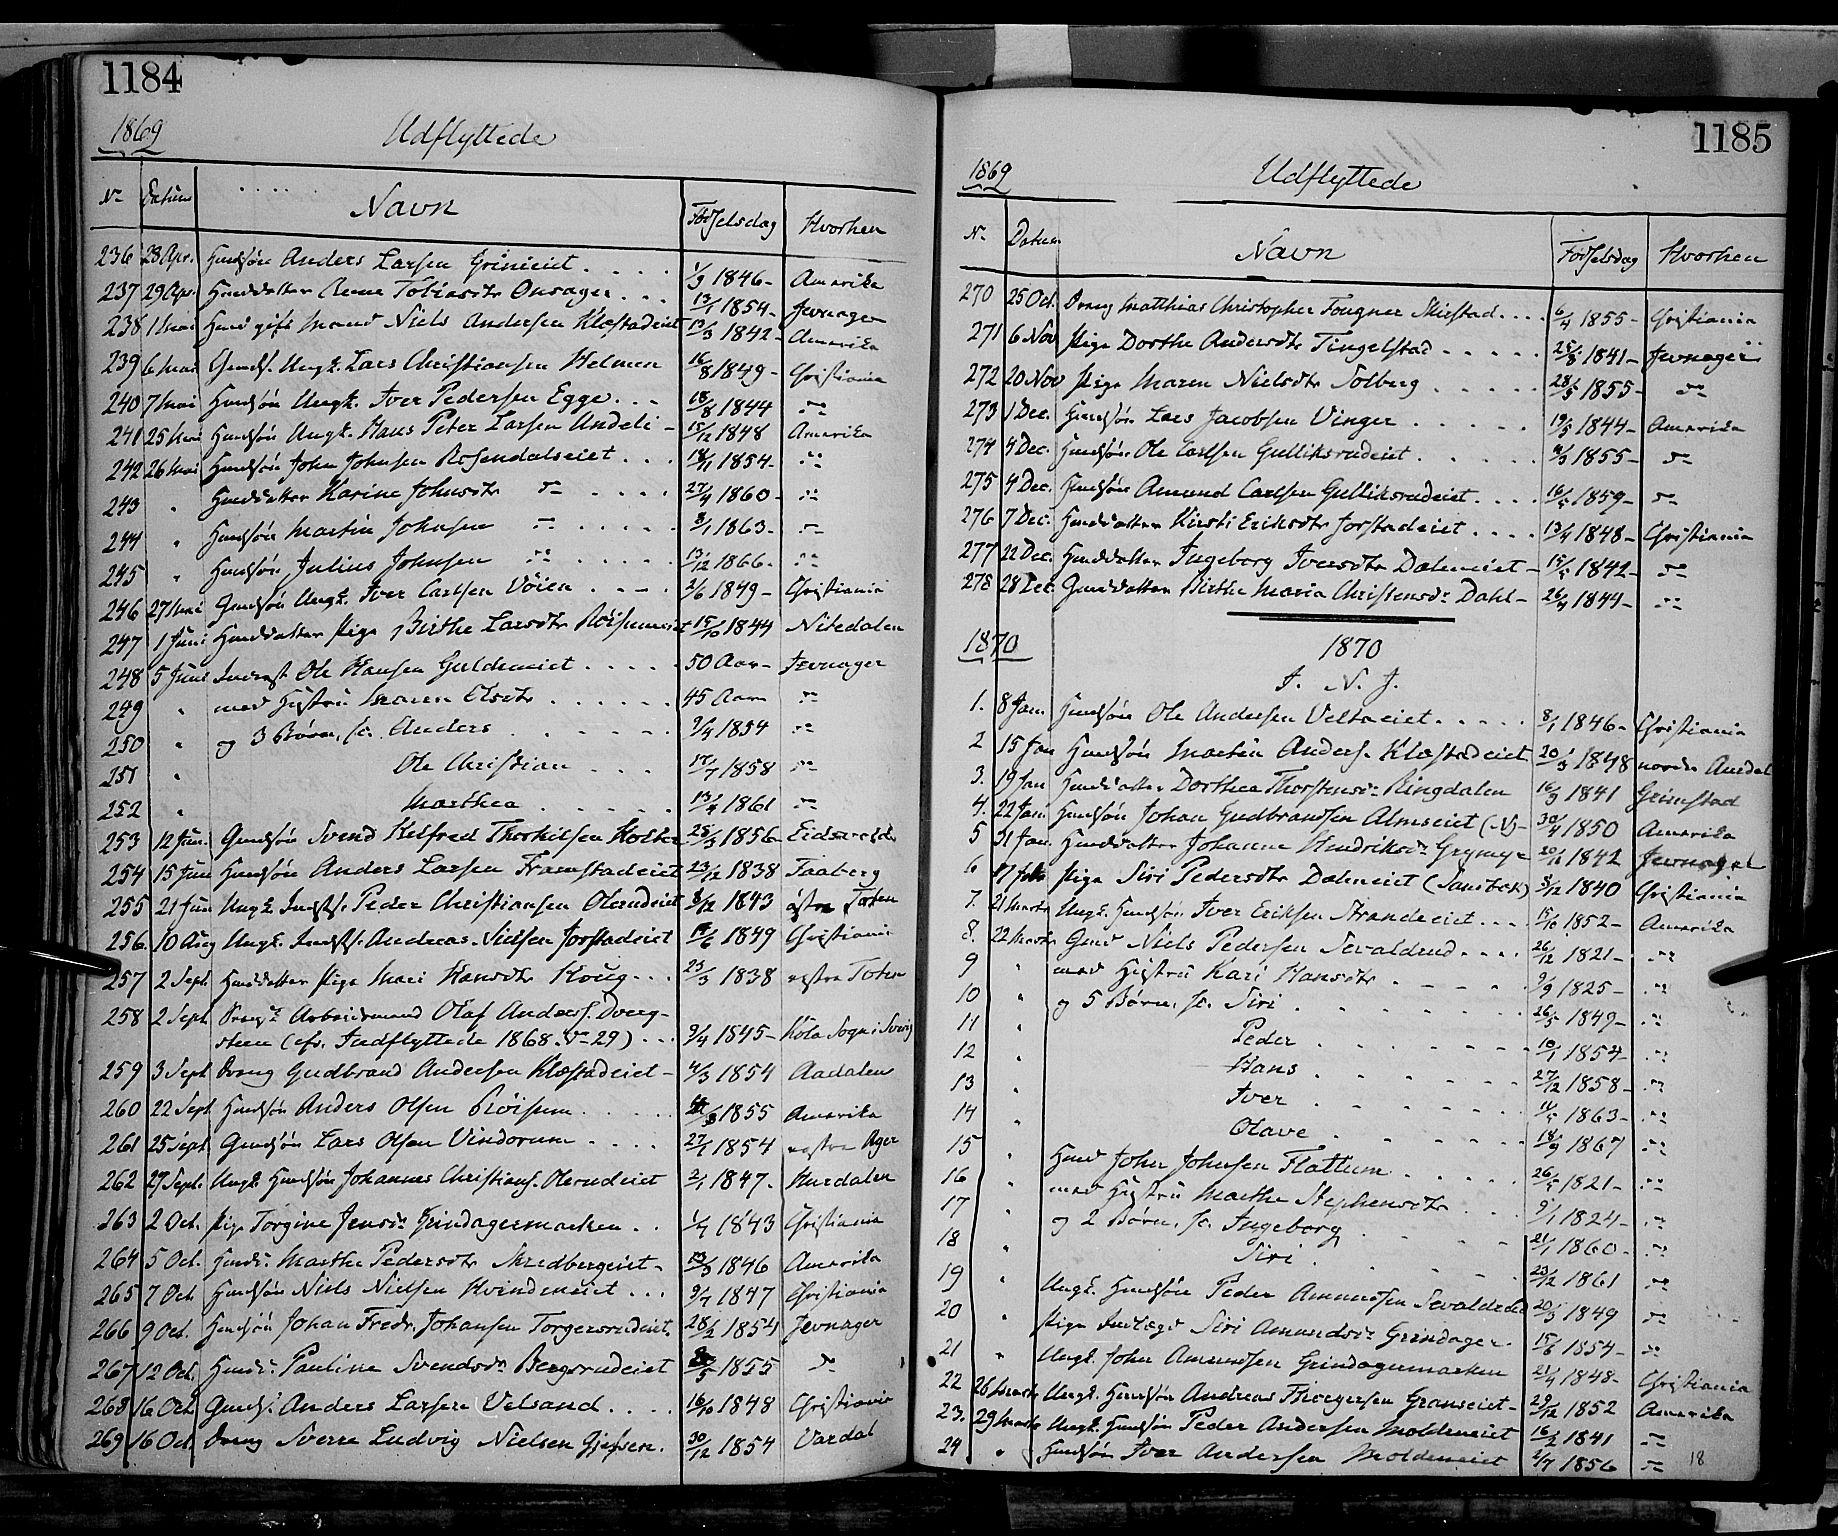 SAH, Gran prestekontor, Ministerialbok nr. 12, 1856-1874, s. 1184-1185